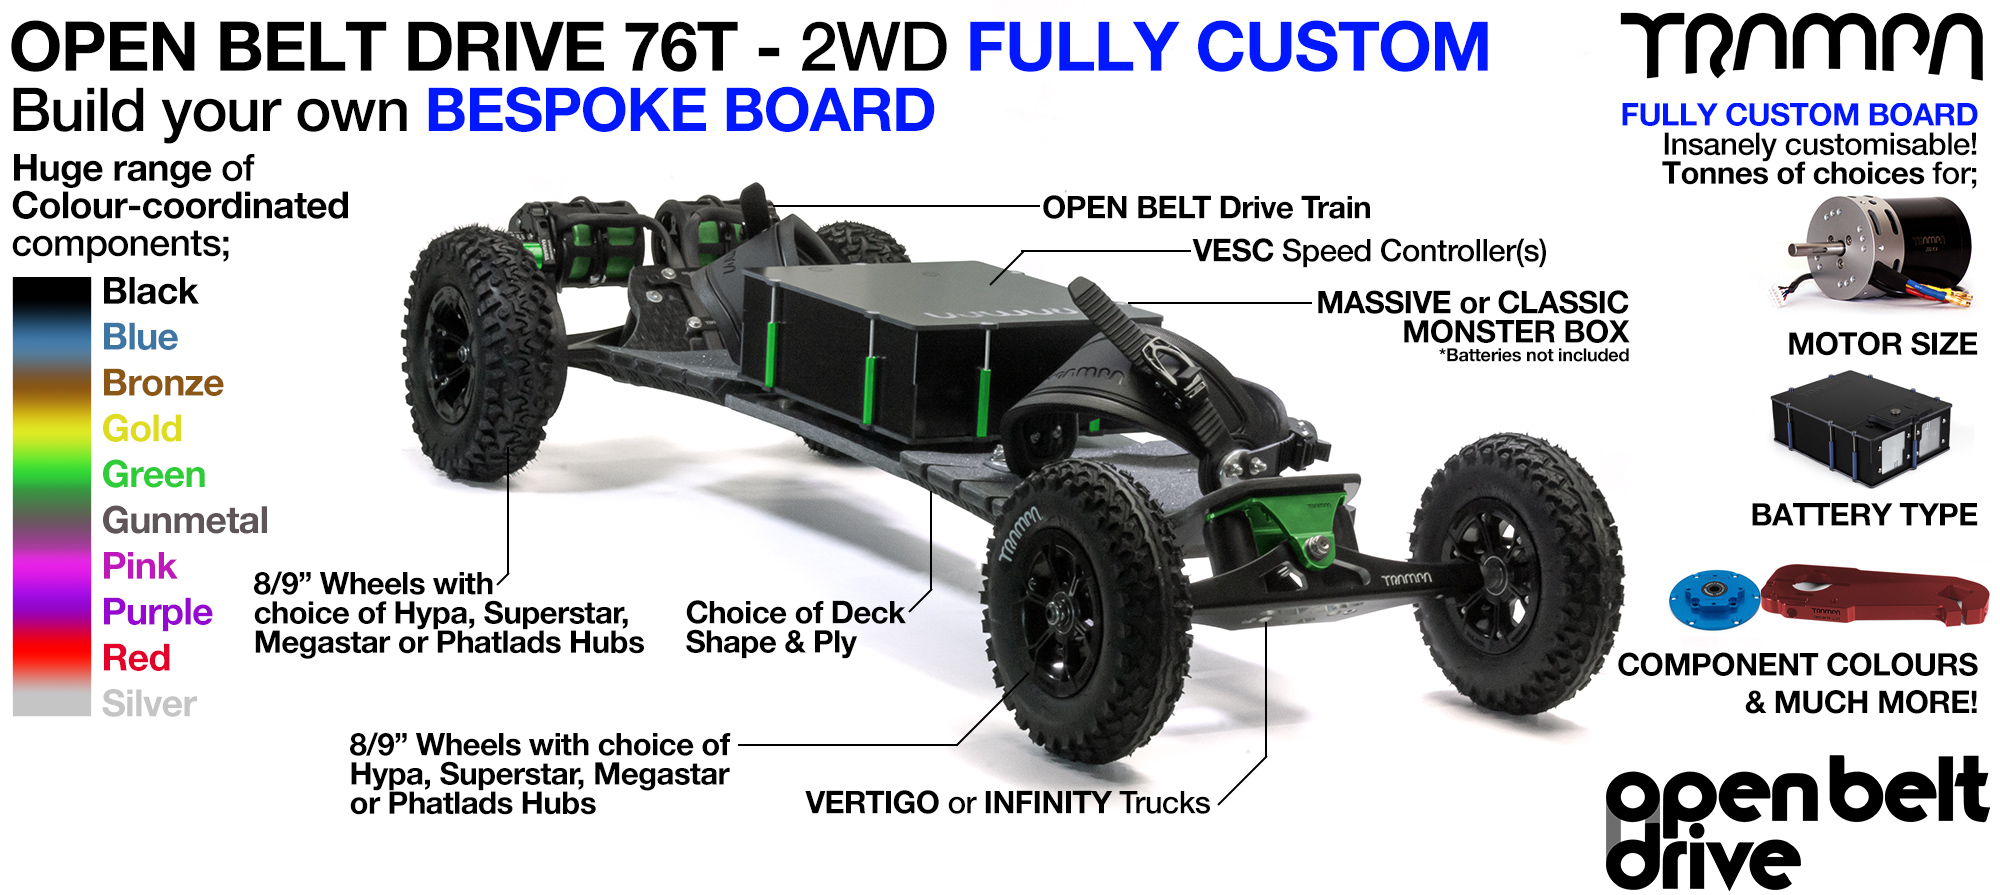 2WD OPEN BELT DRIVE E-MTB with 76T Pulleys - CUSTOM